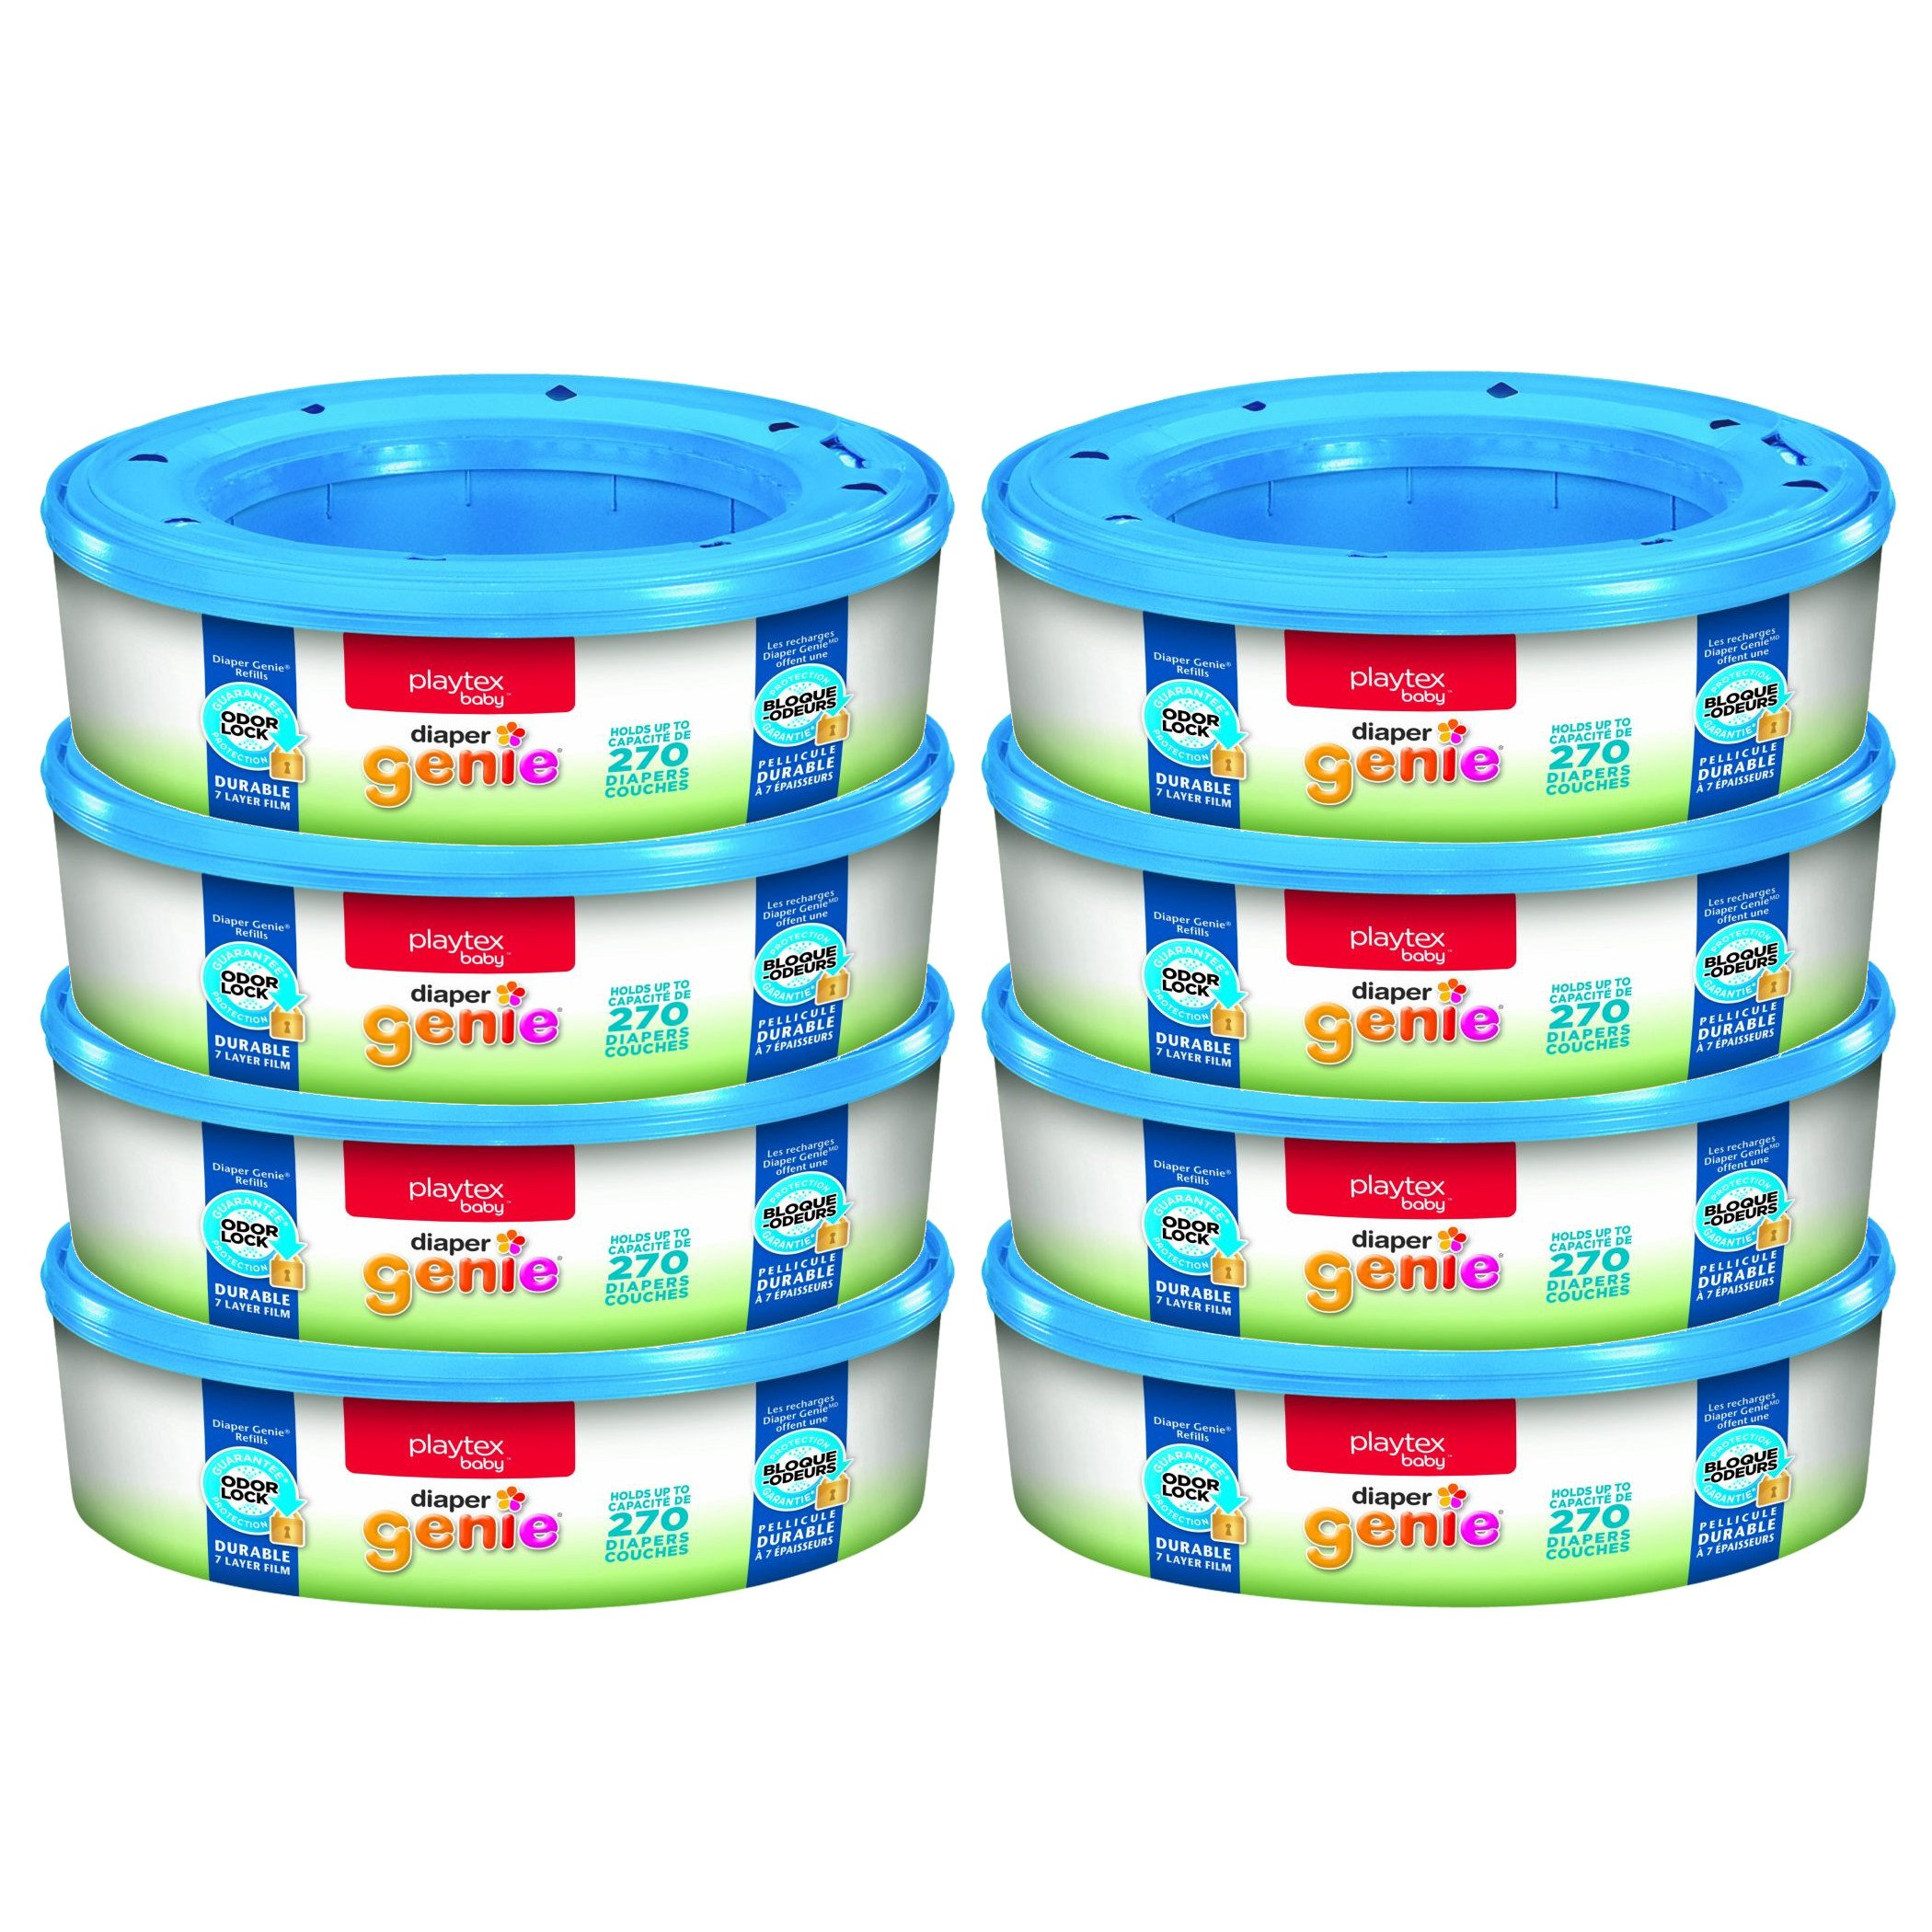 Amazon.com: Playtex Diaper Genie Elite Diaper Disposal